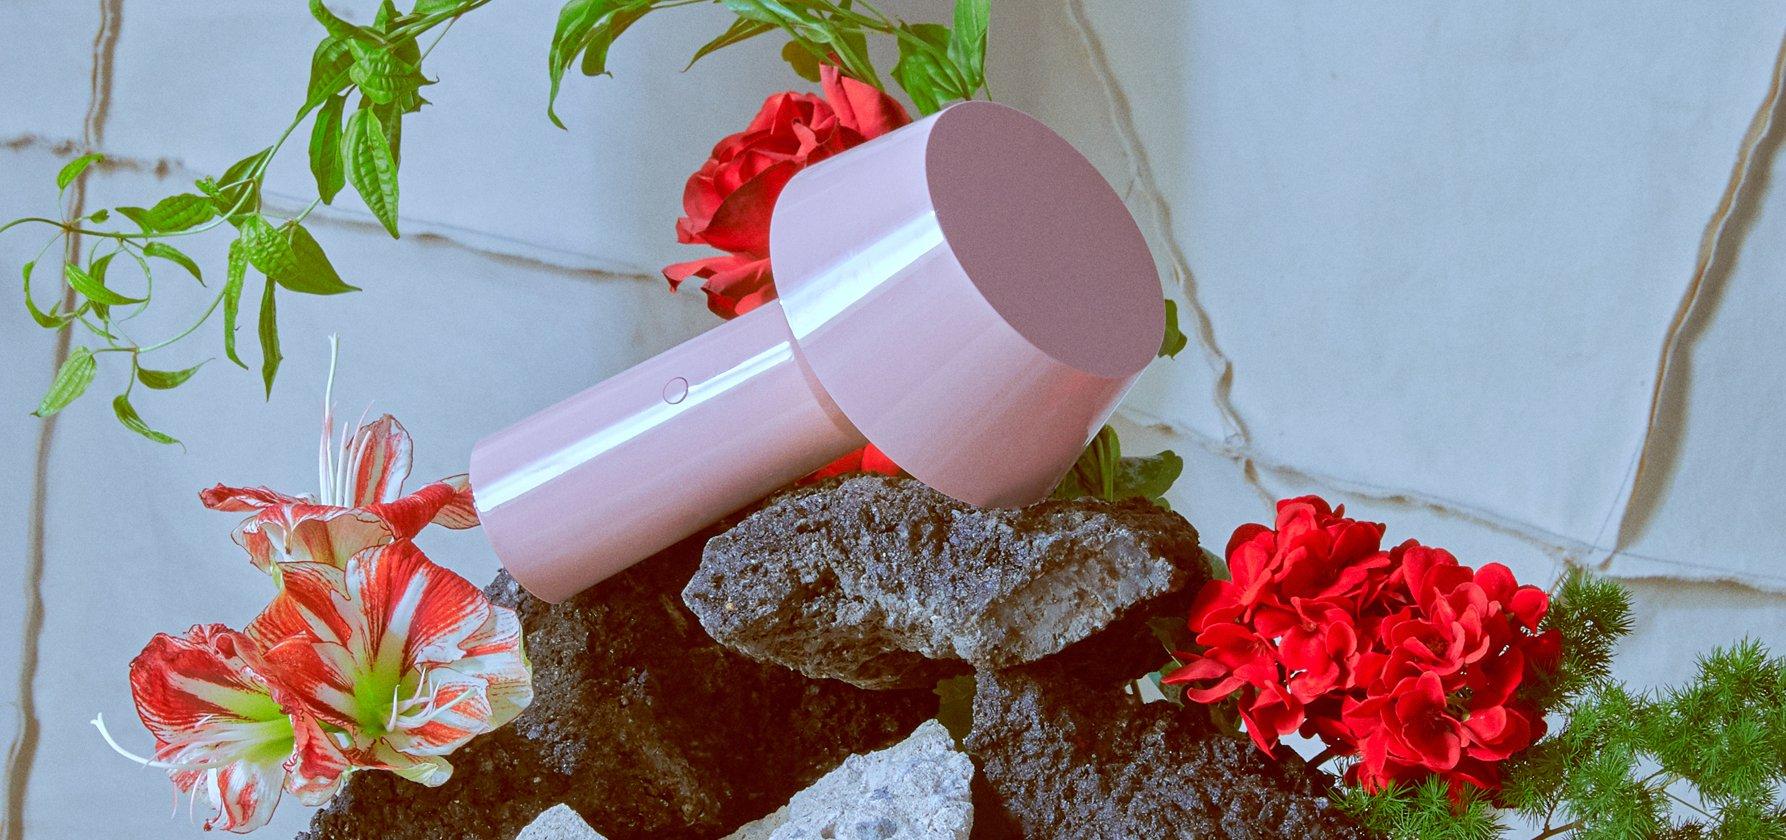 Marset Lighting Usa Taking Care Of Light Wiring Outdoor Lights Australia Flowers Rocks Beauty